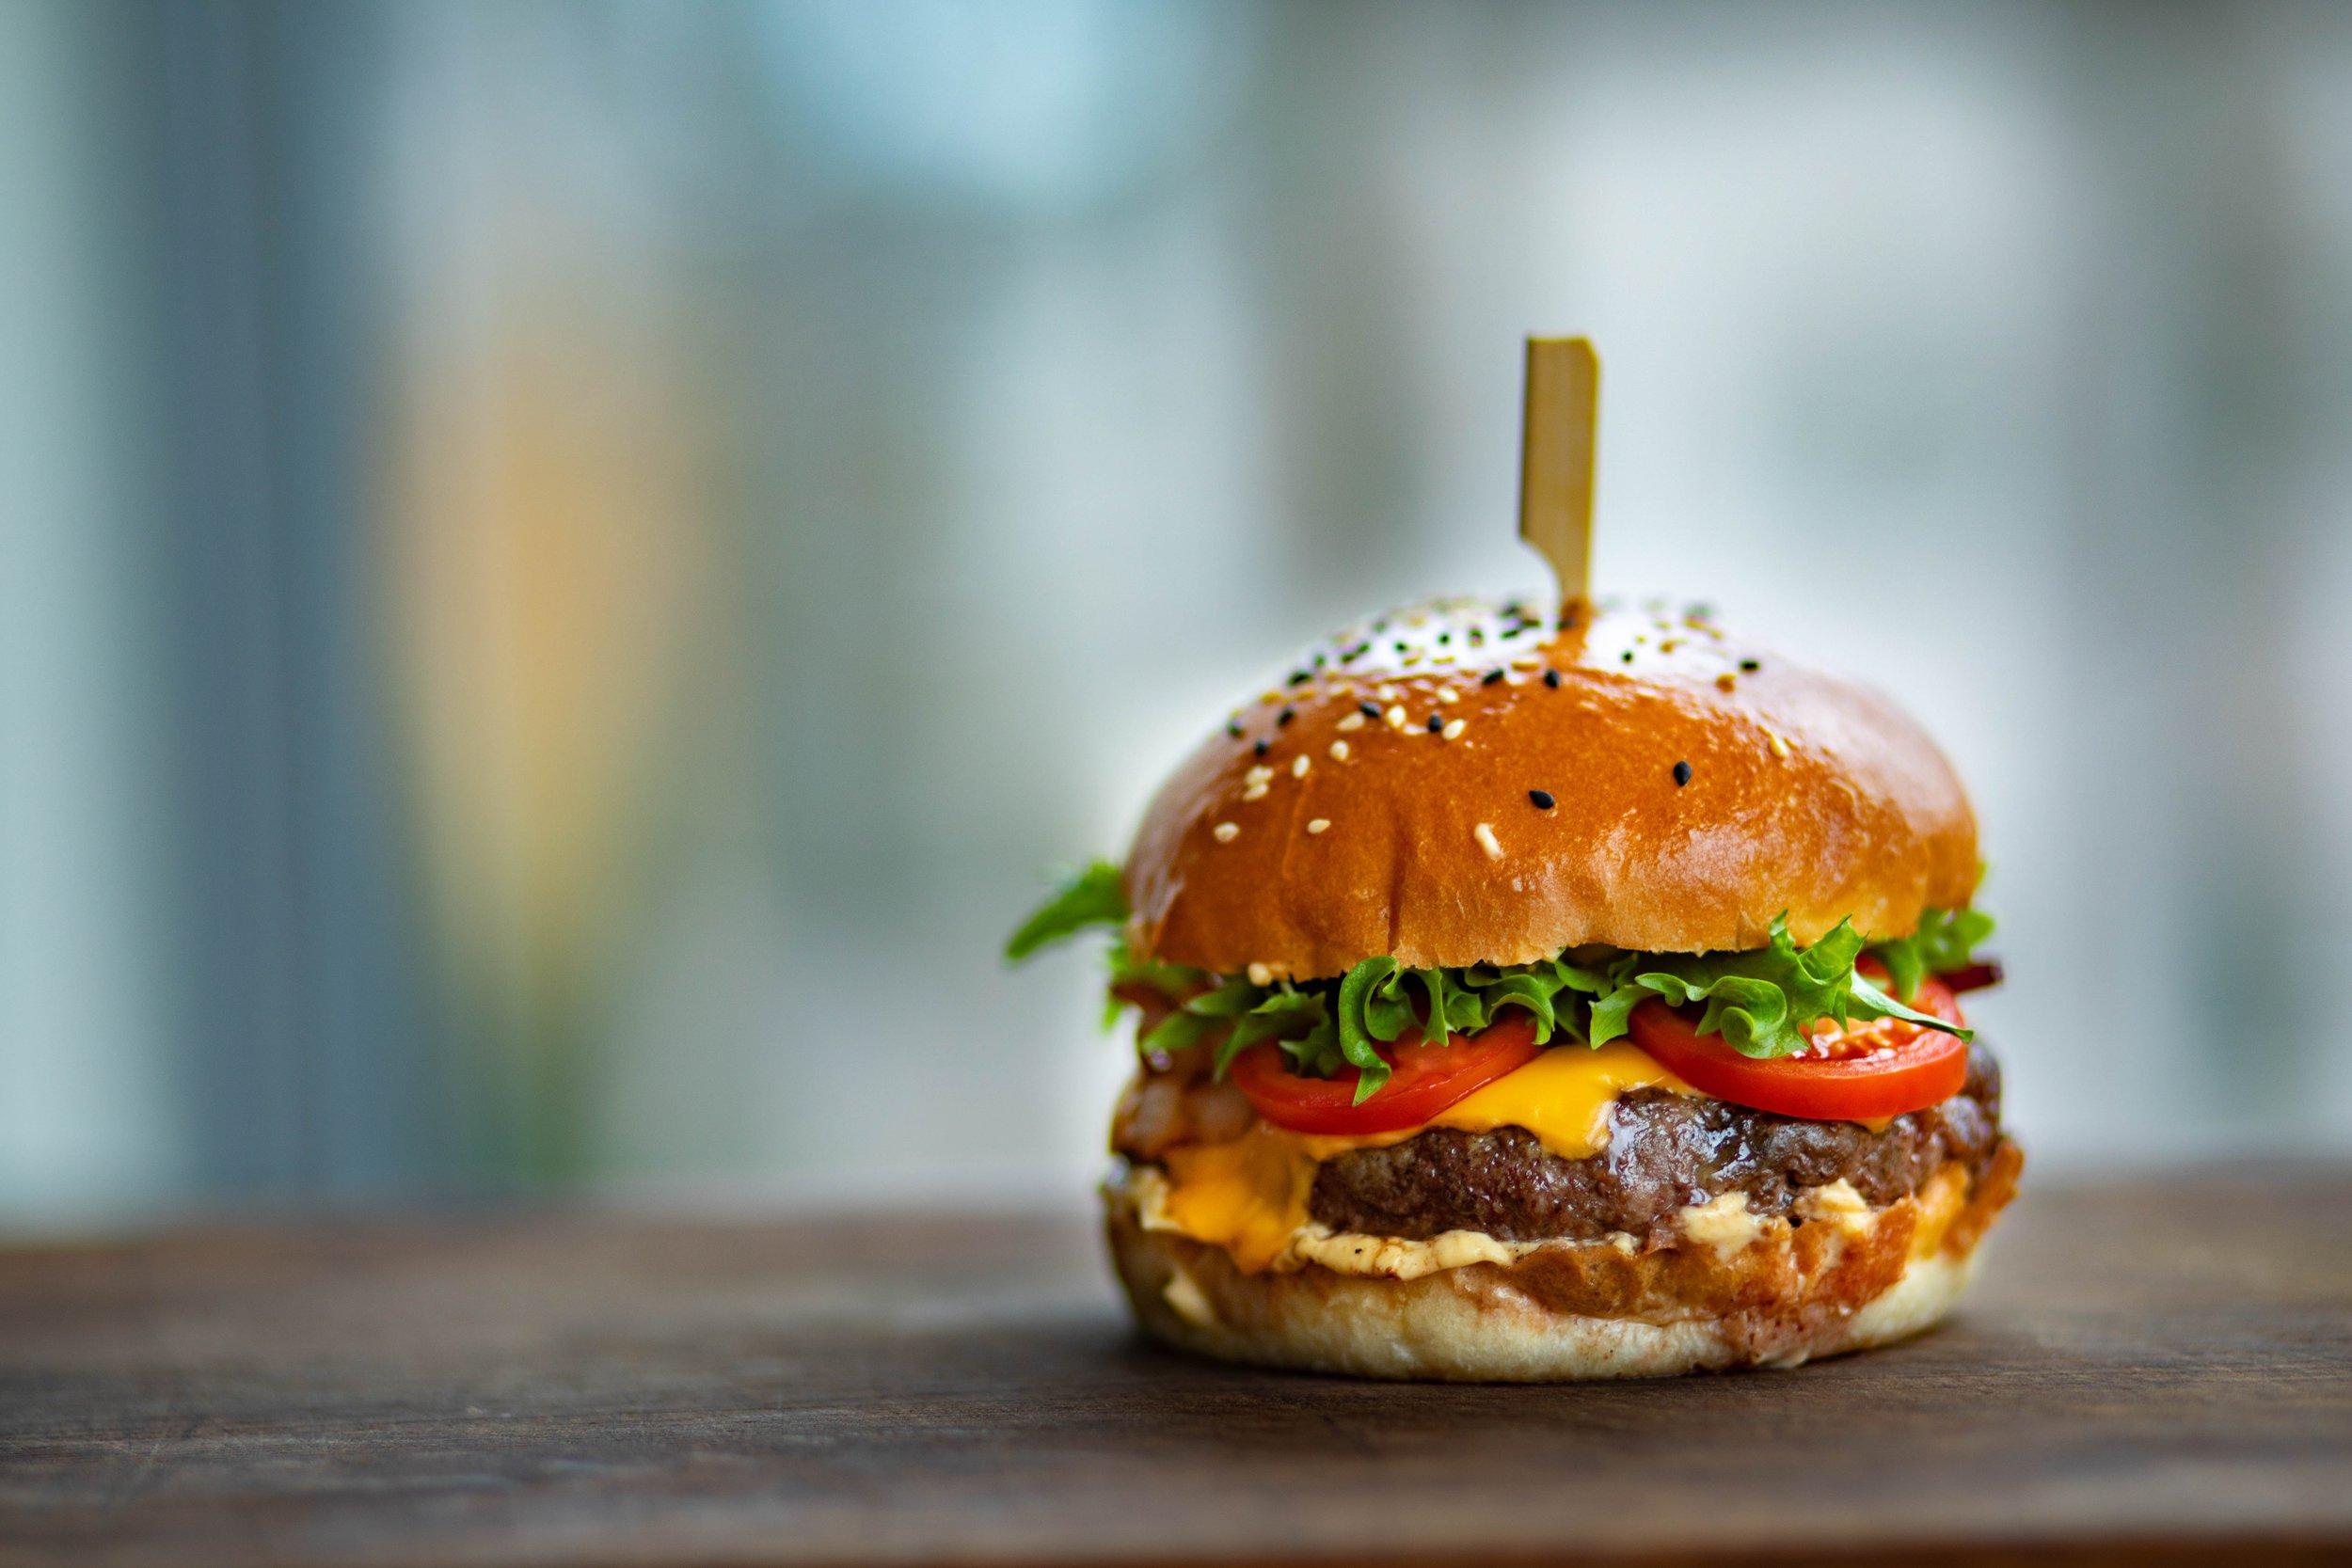 burger-close-up-delicious-1639565.jpg